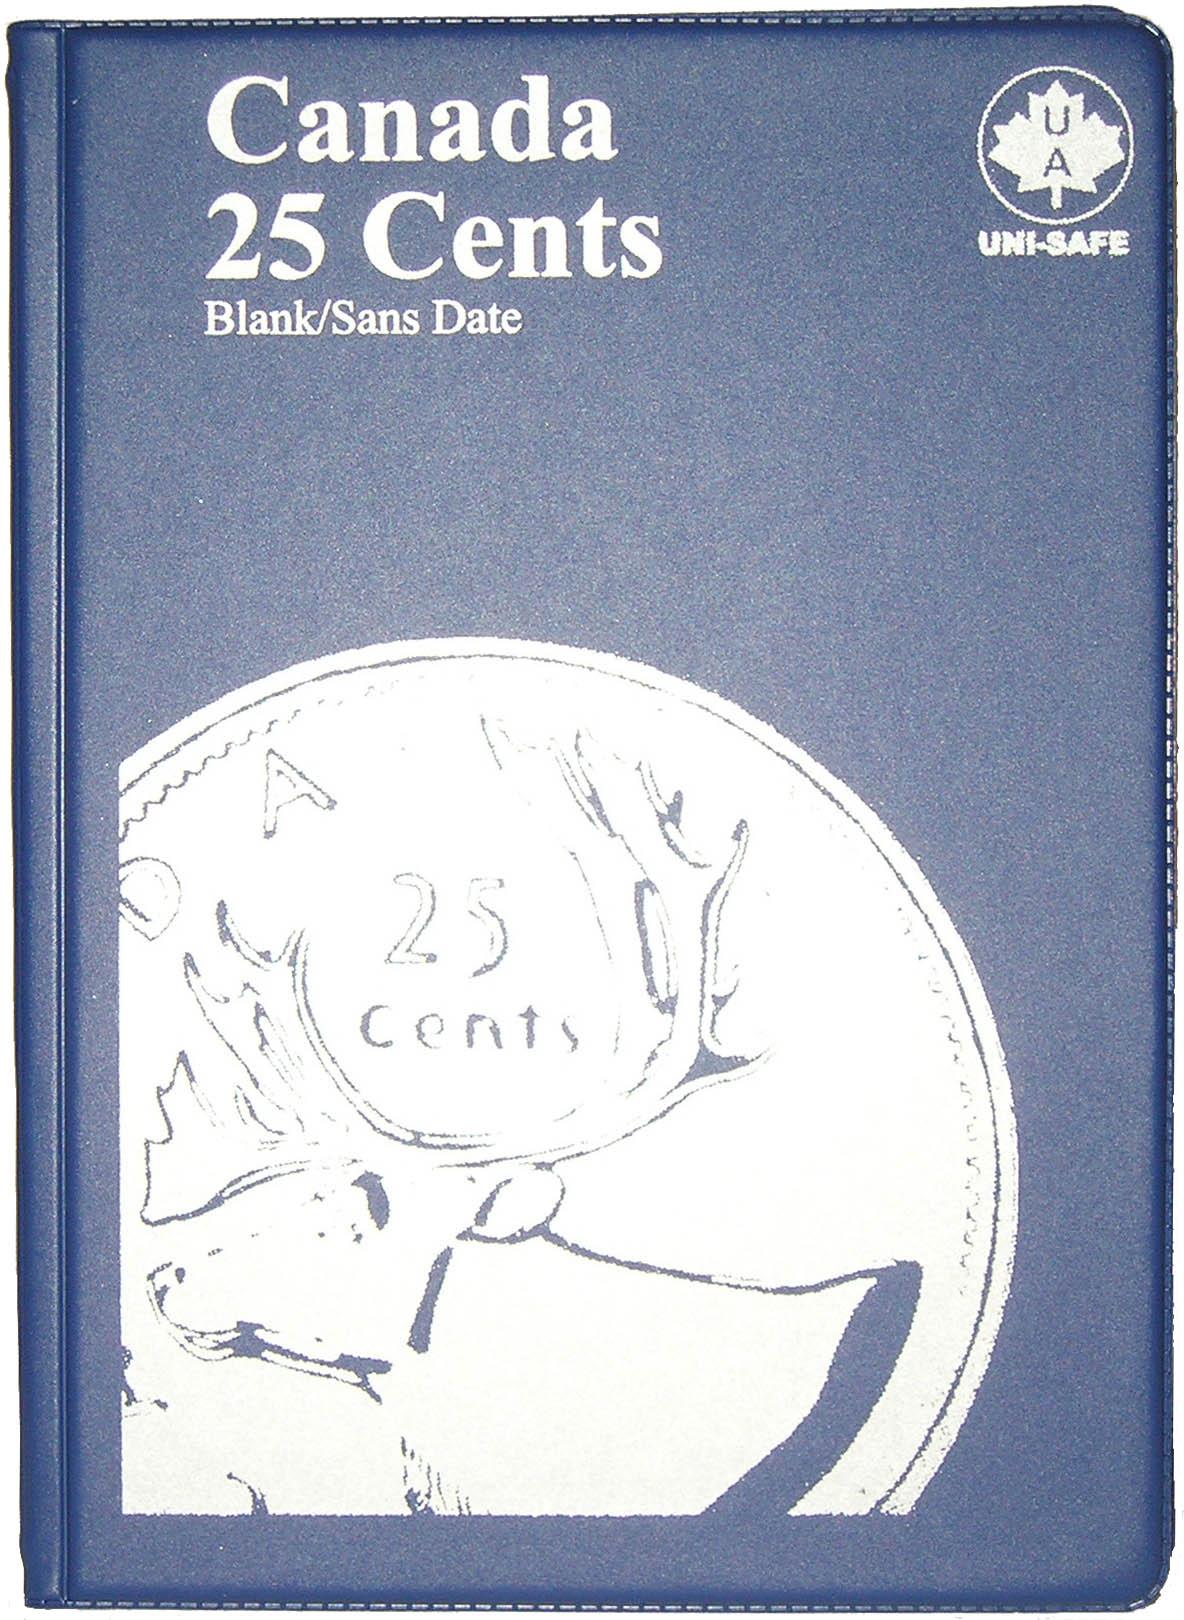 No Date 10 Uni-Safe Canadian Canada 1 Cent Penny Coin Album Folder Blank